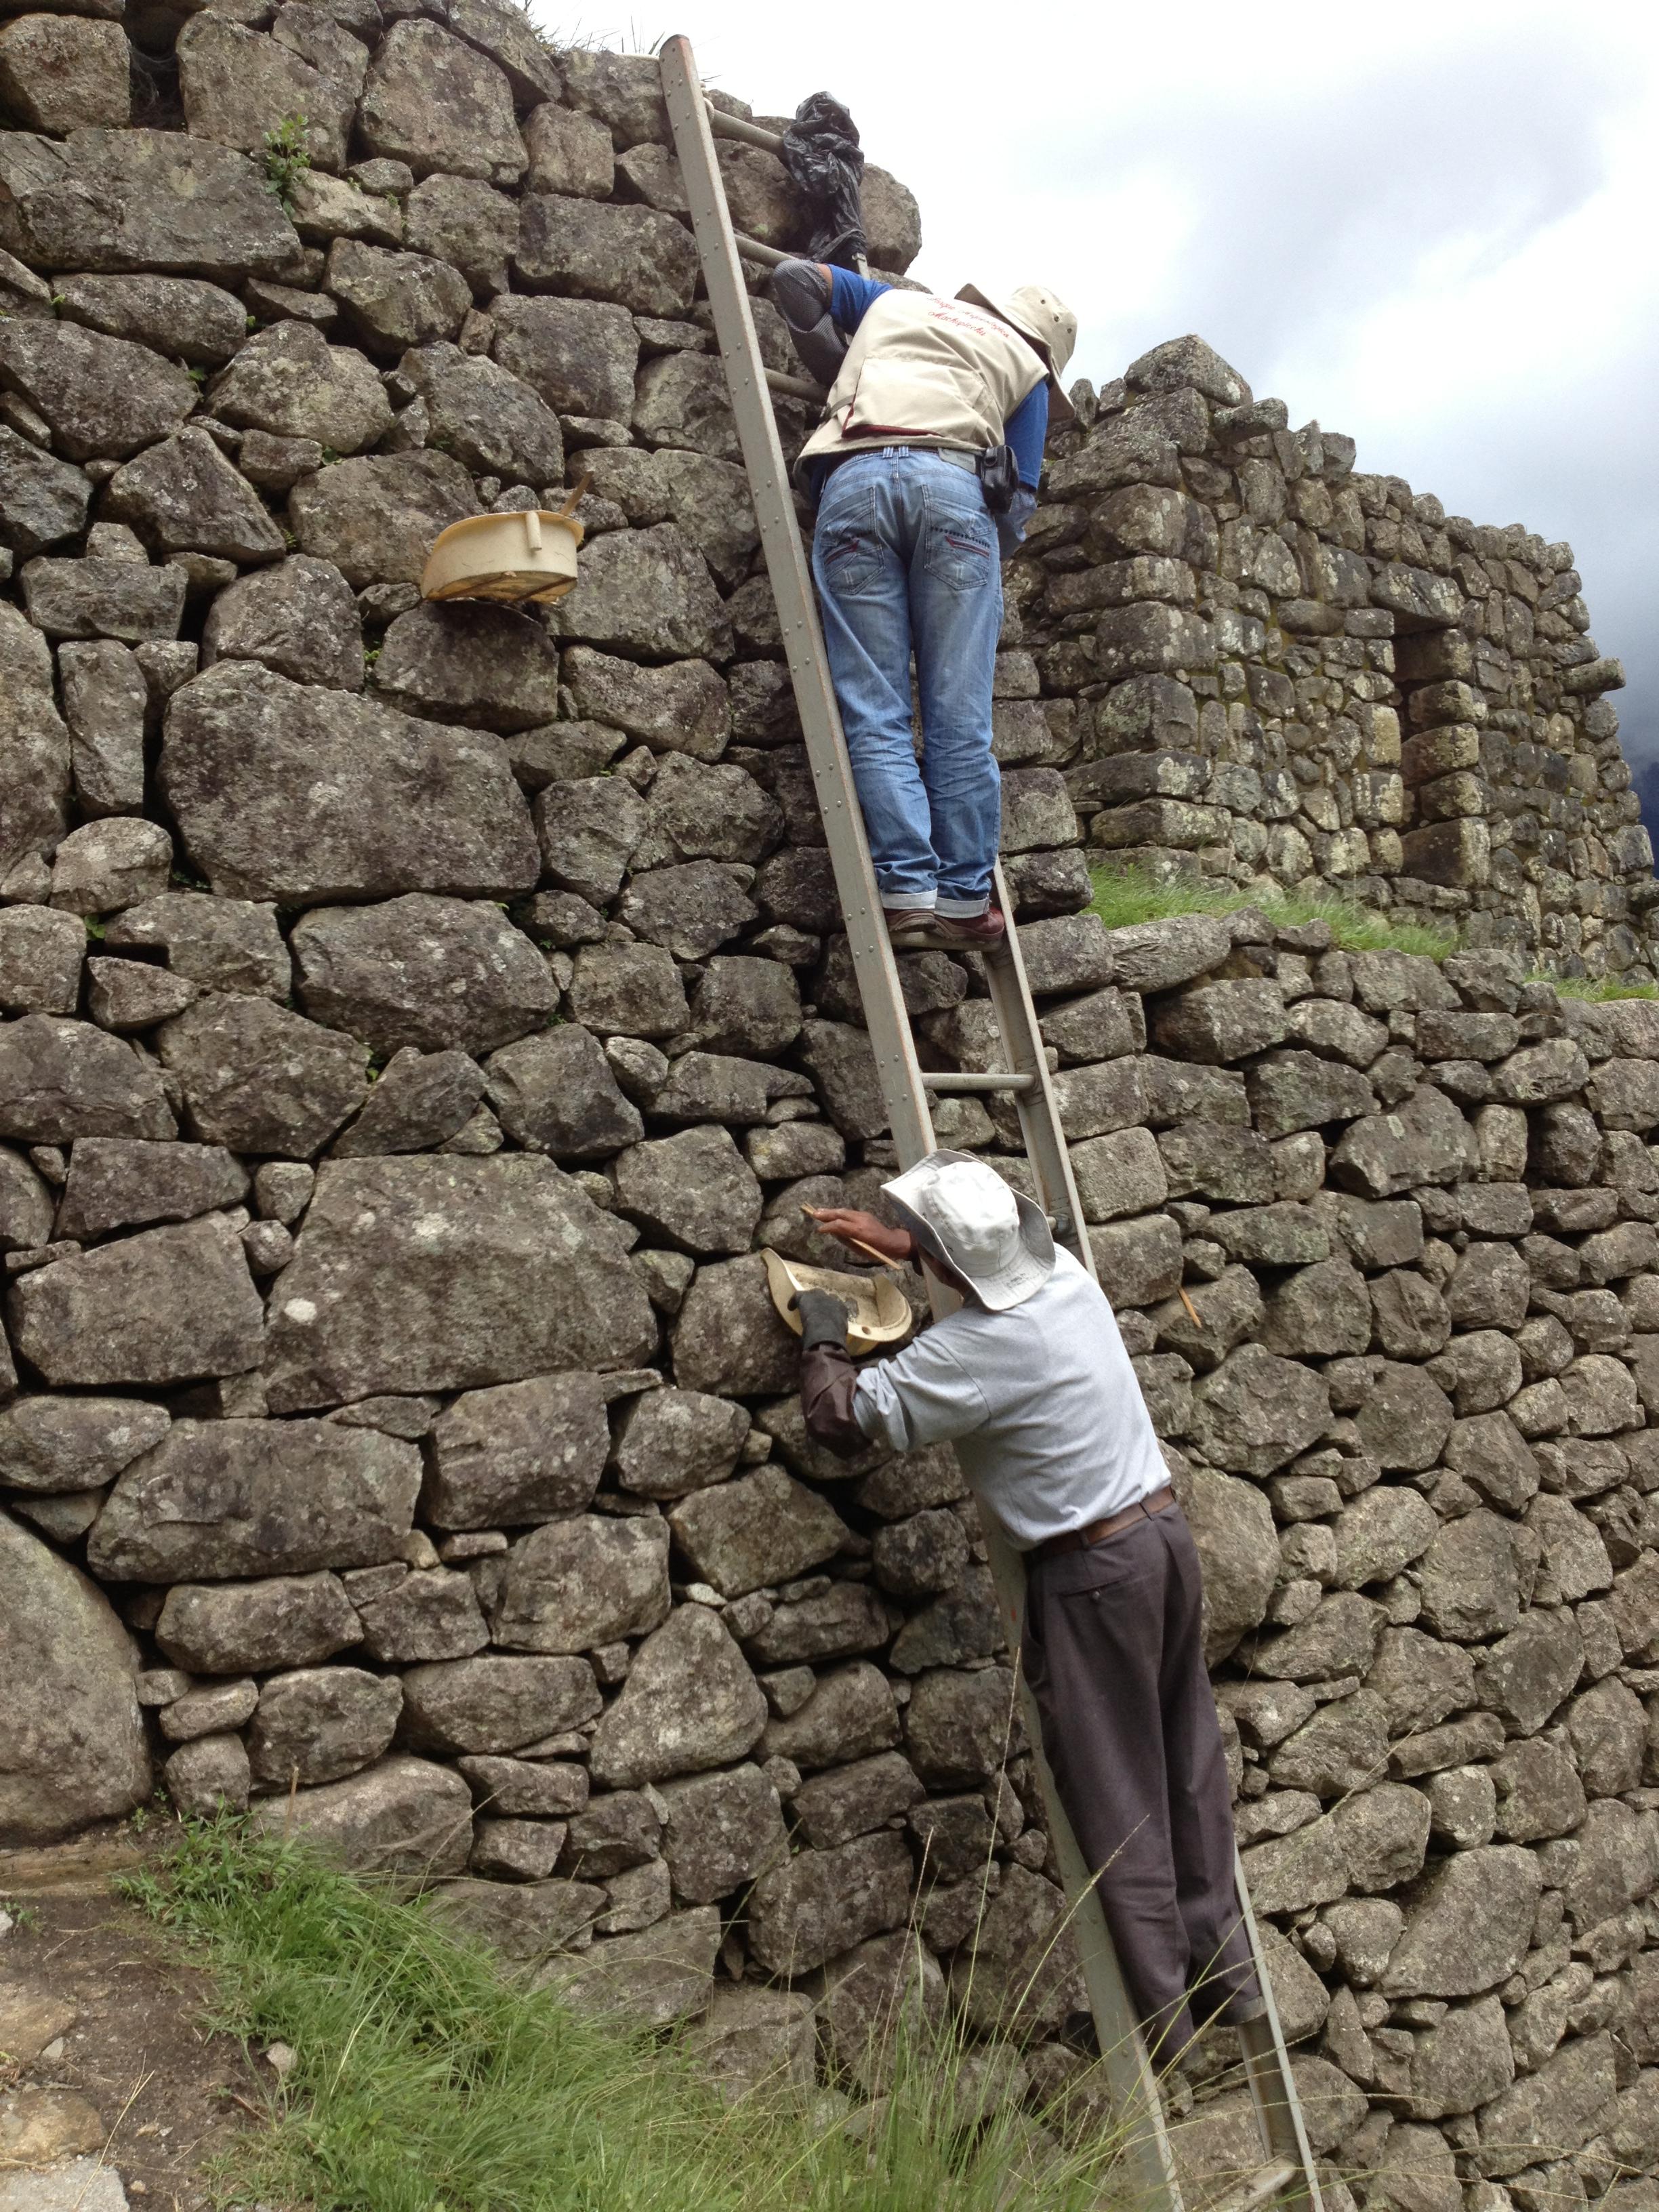 A rock polisher at Machu Picchu